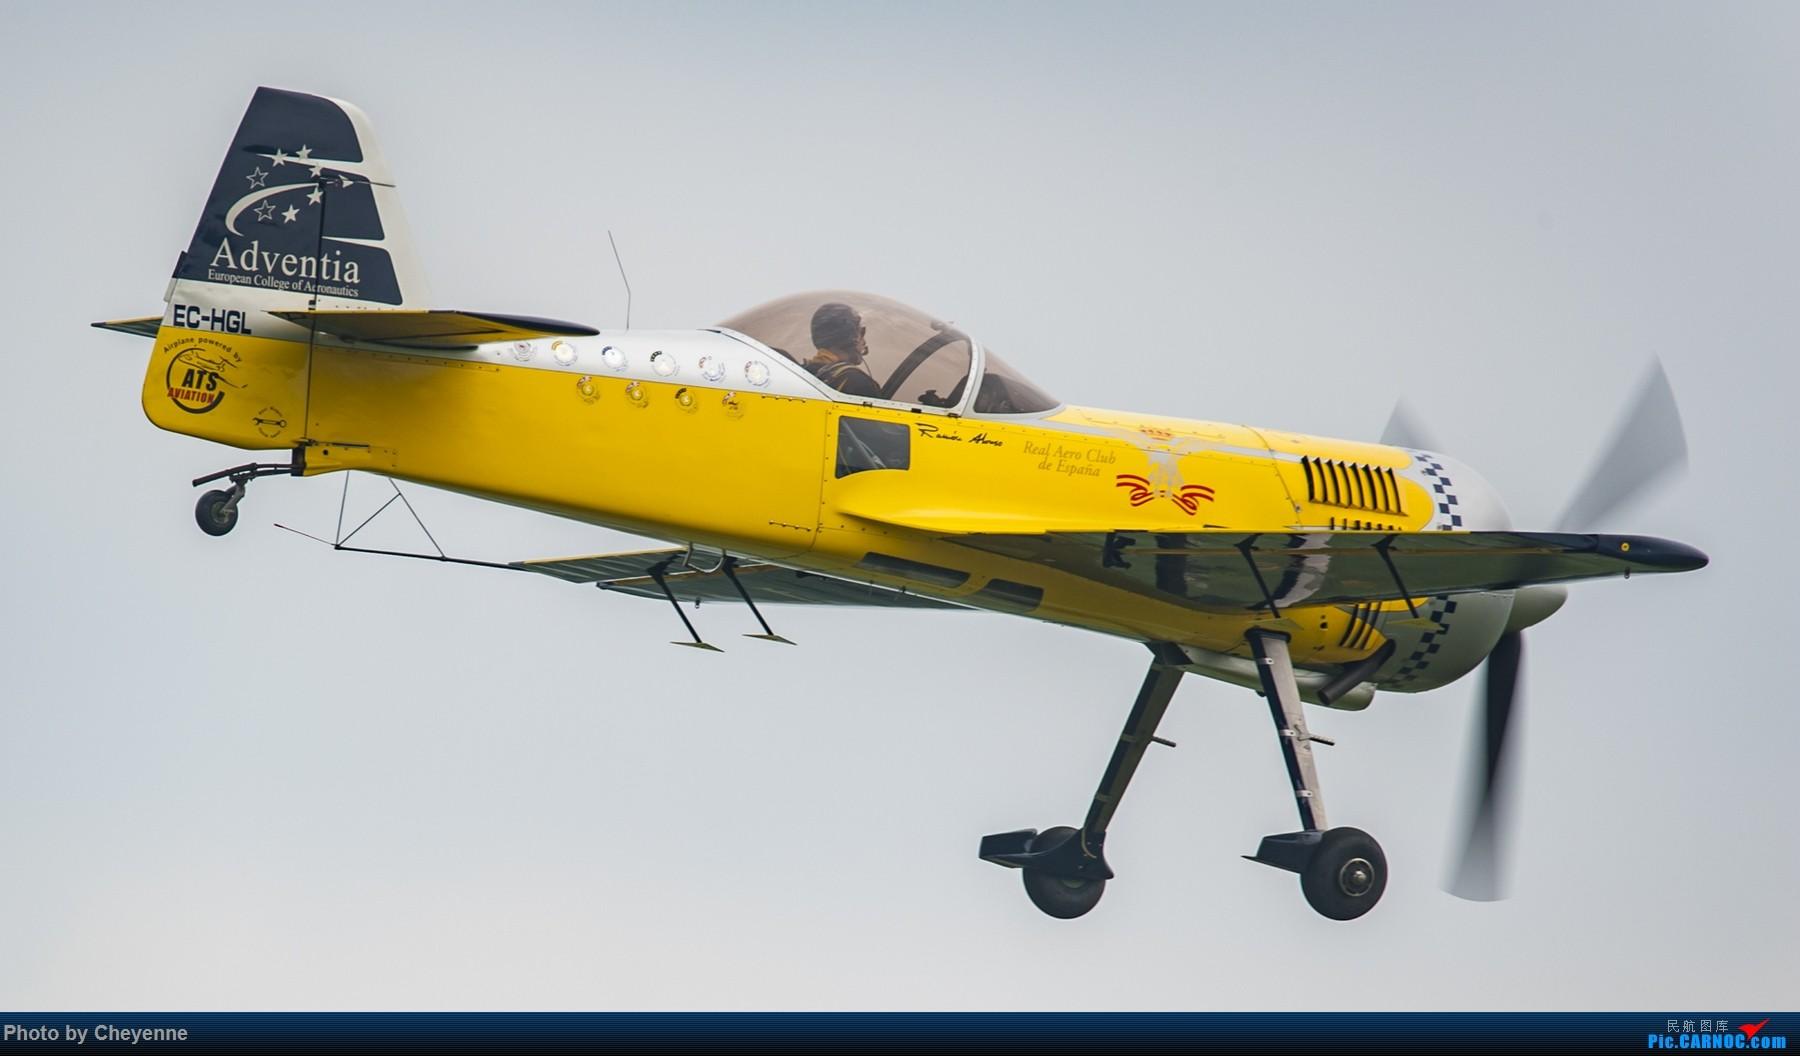 Re:[原创]外面遛遛就好,瞅瞅可爱的华约小蜜蜂 SUKHOI SU-31 EC-HGL 中国广汉机场